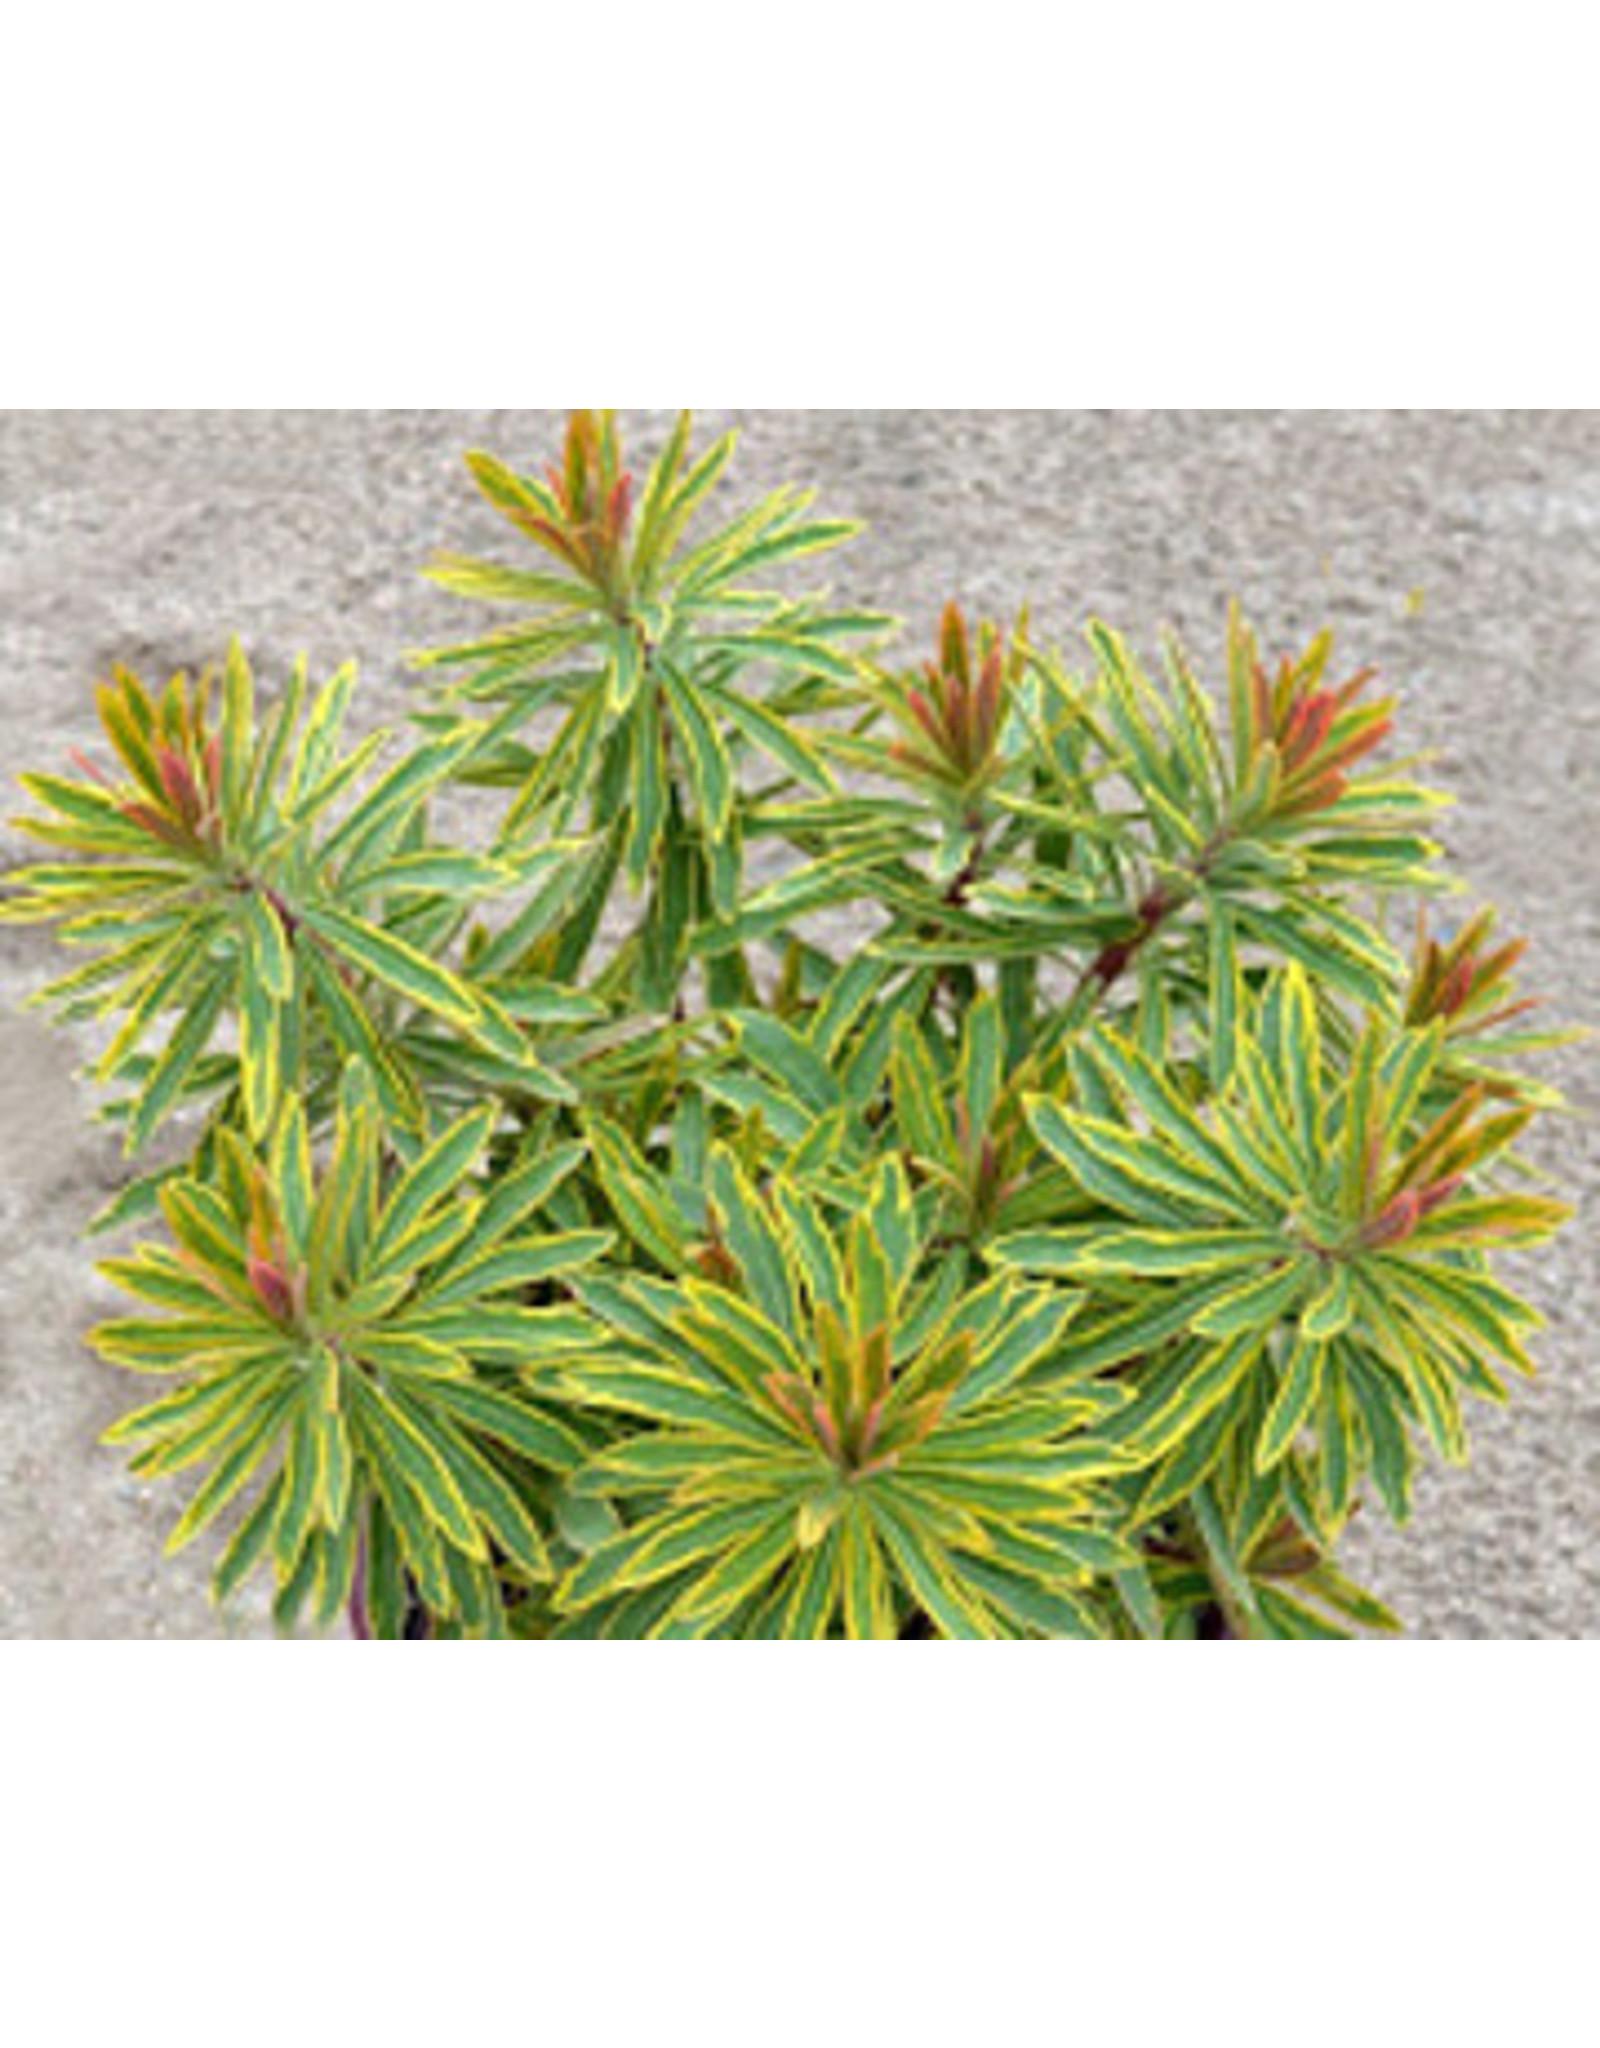 Euphorbia - Euphorbia x Martinii 'Ascot Rainbow'  1 Gallon